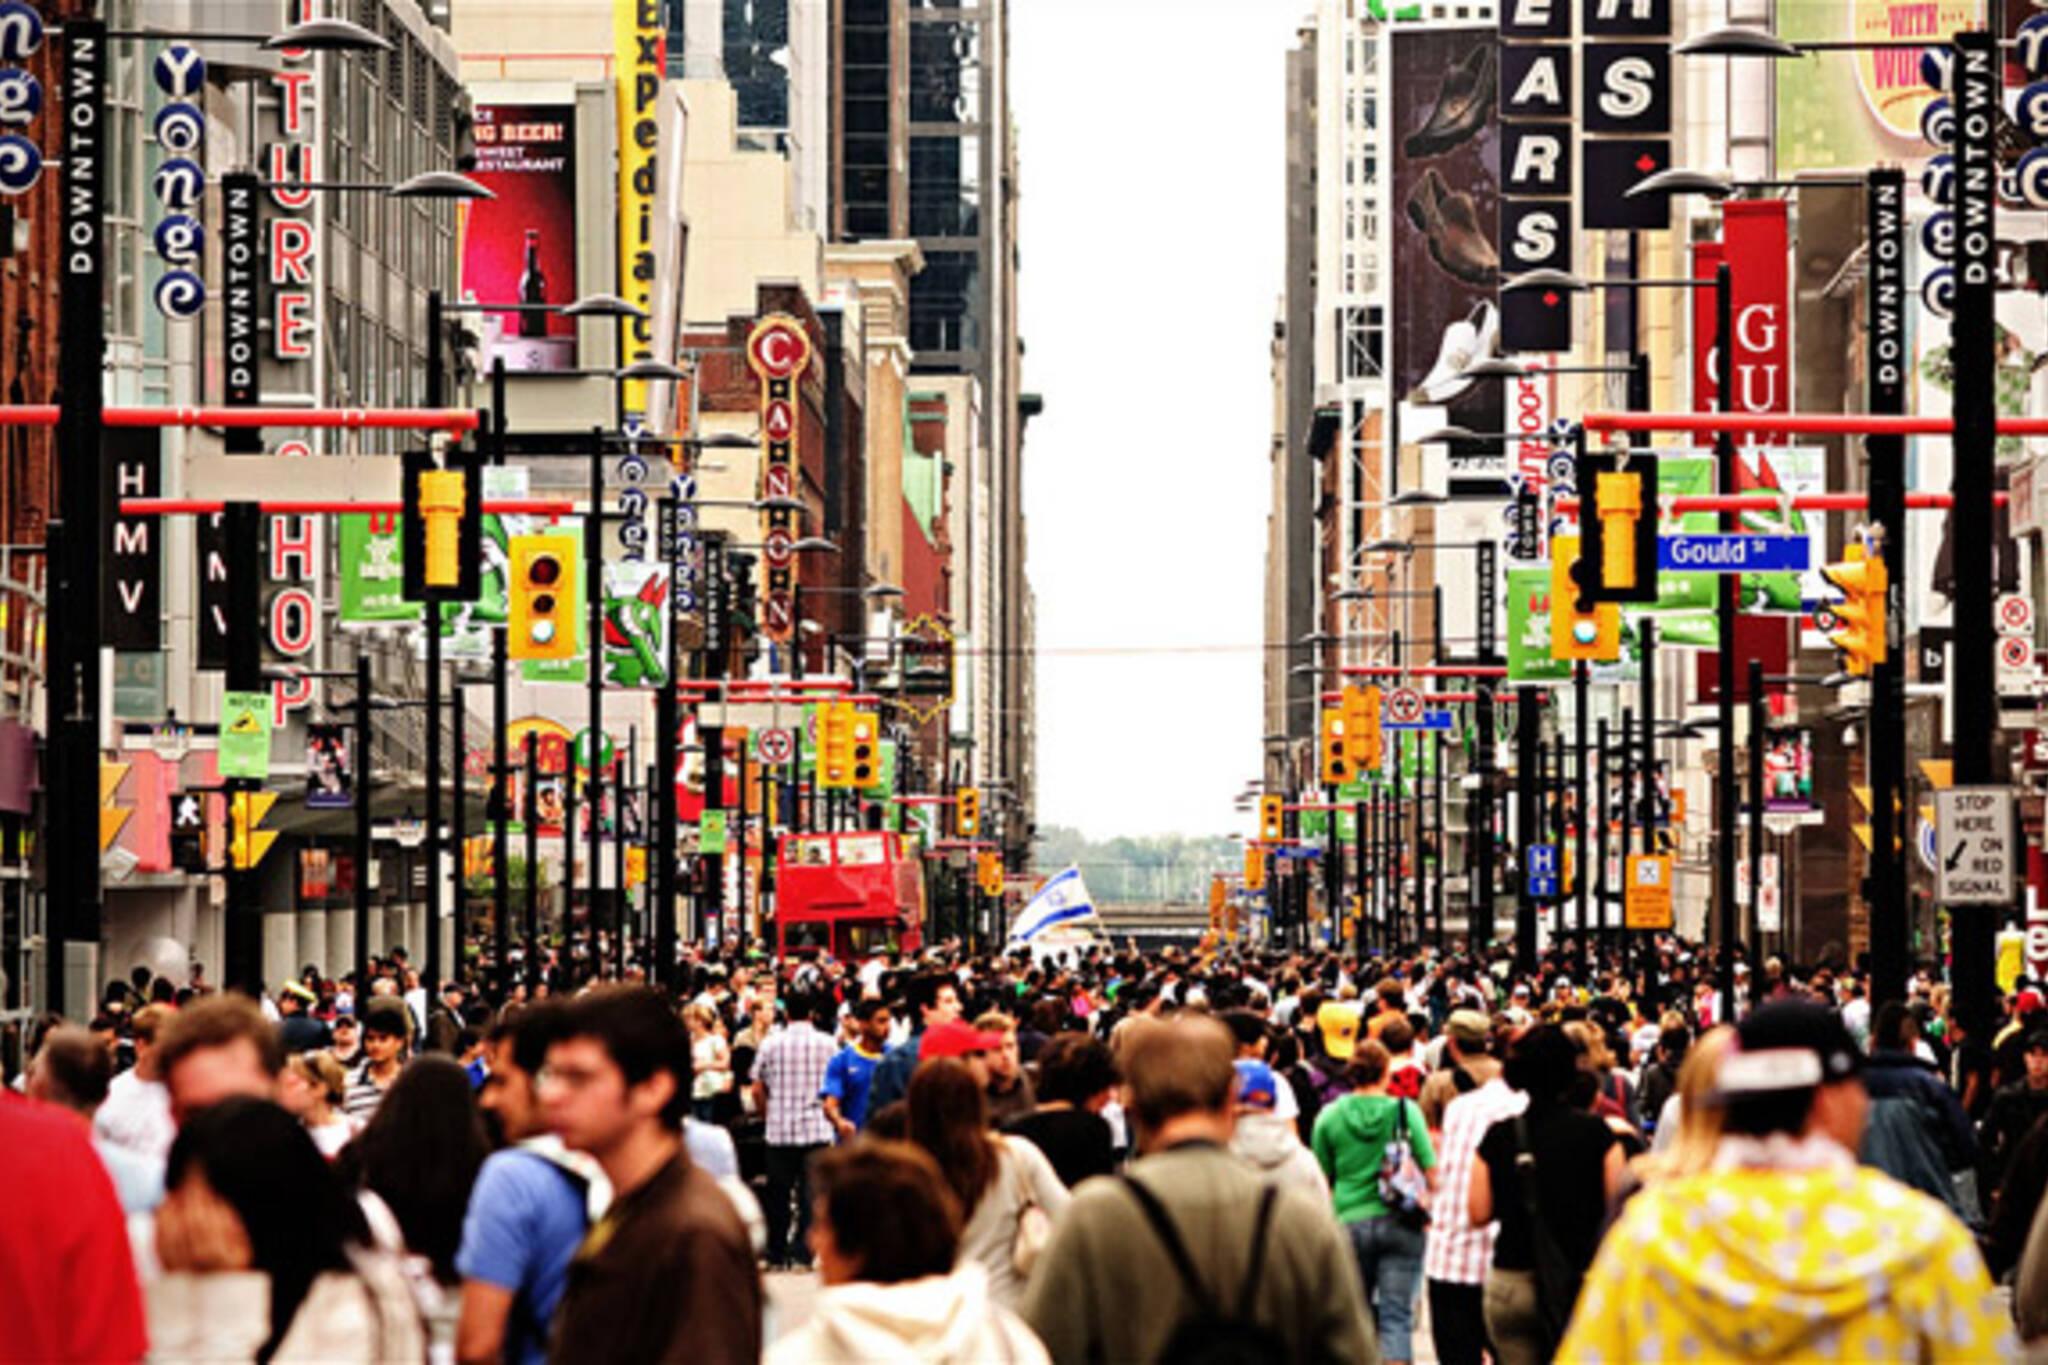 Yonge Street Pedestrian Mall